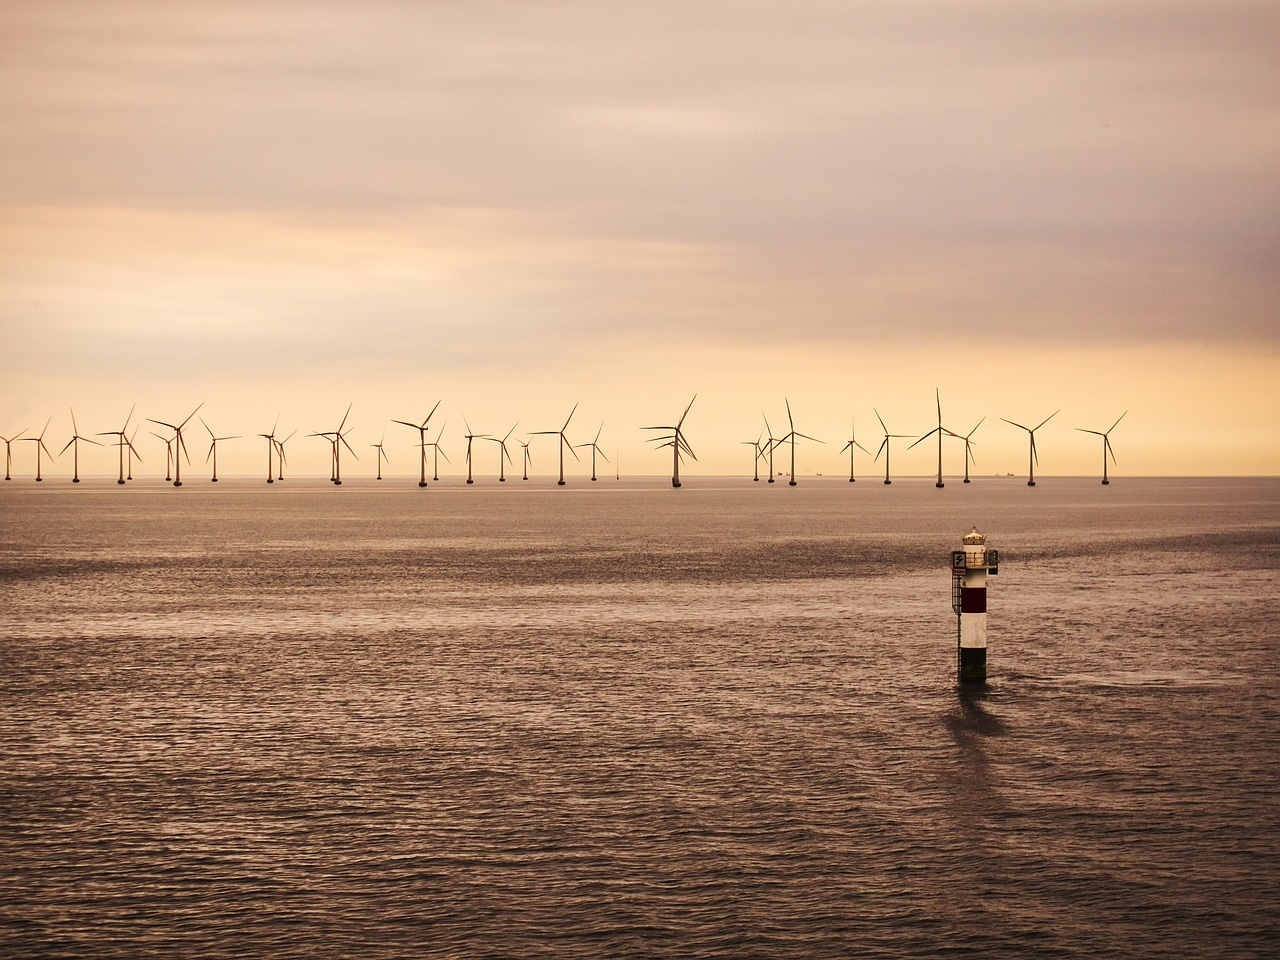 Offshore Wind Turbines, YSG Solar